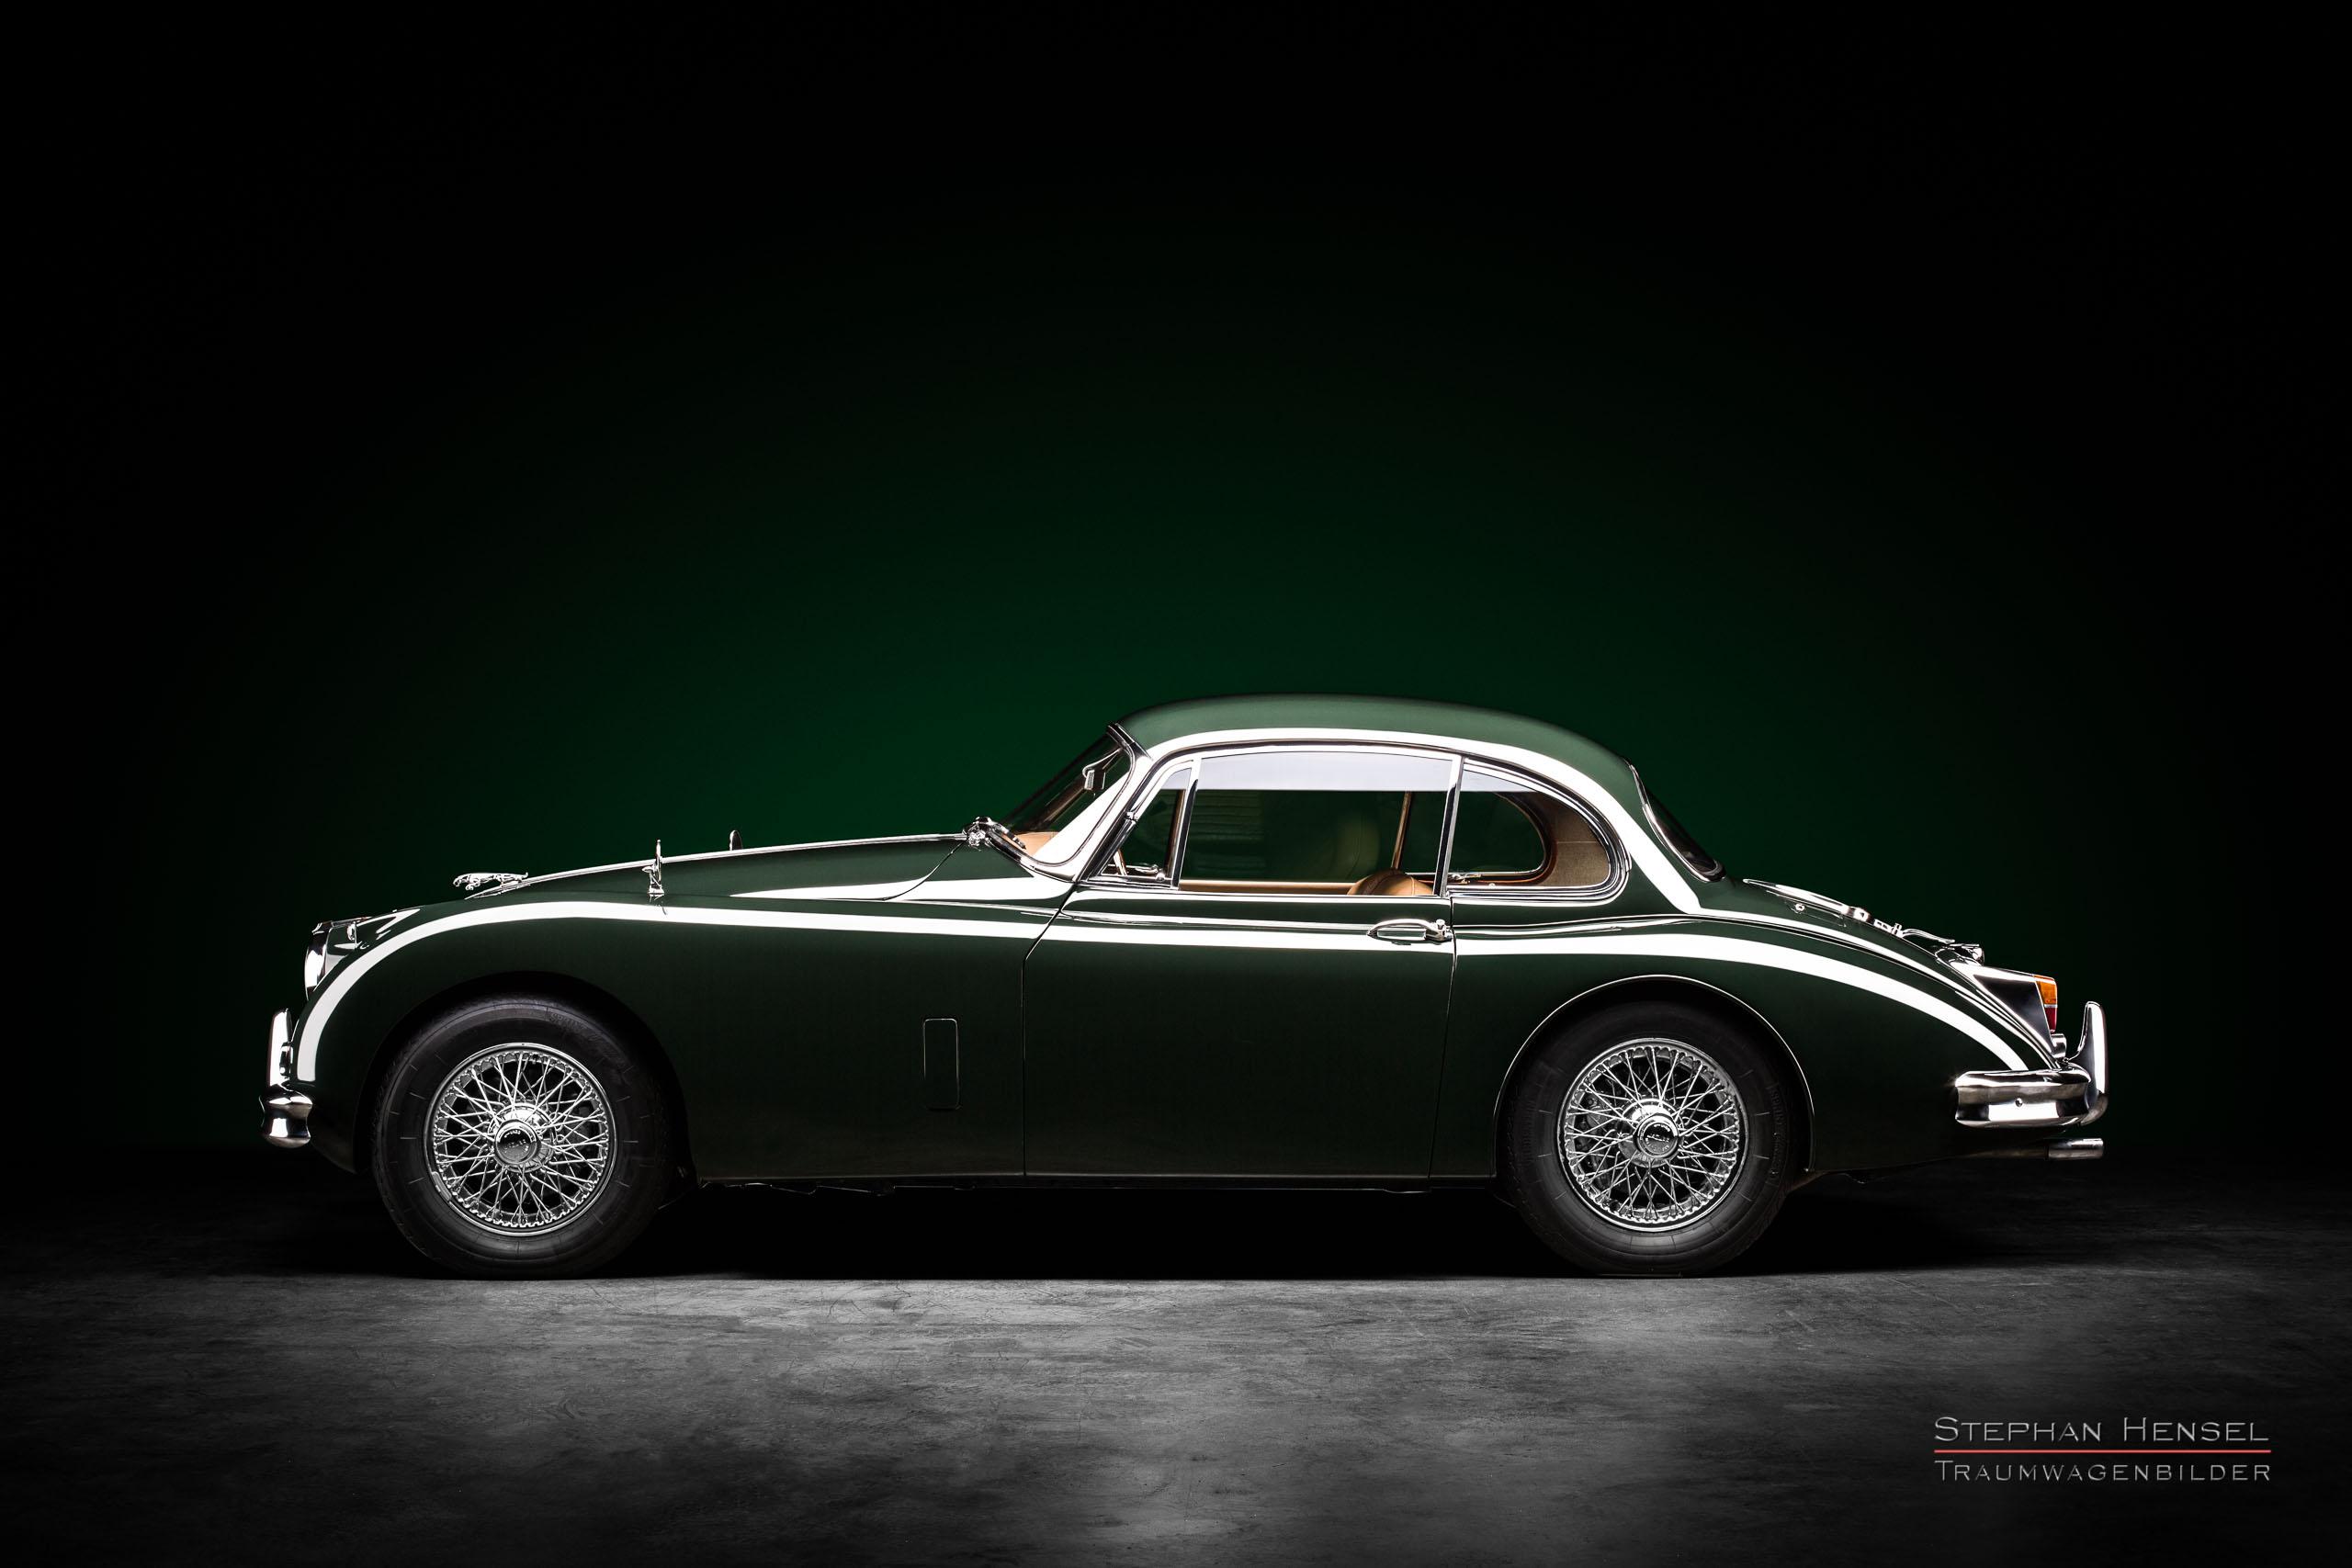 Jaguar XK 150 FHC, 1960, Seitenansicht, Autofotograf, Hamburg, Automobilfotograf, Oldtimerfotograf, Oldtimerfotografie, Car Photography, Stephan Hensel